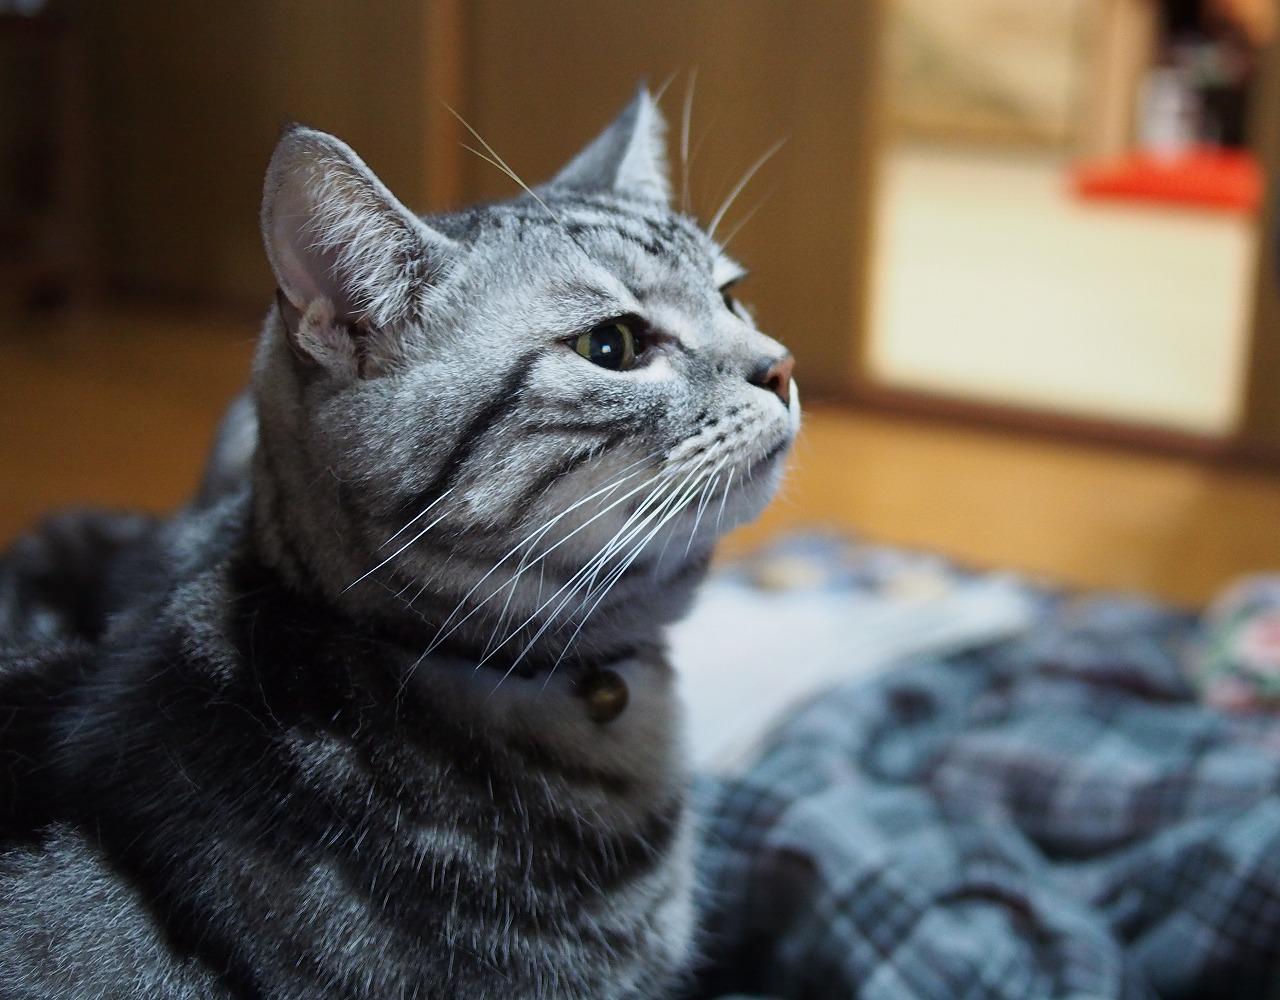 20180101-Cats-O01.jpg